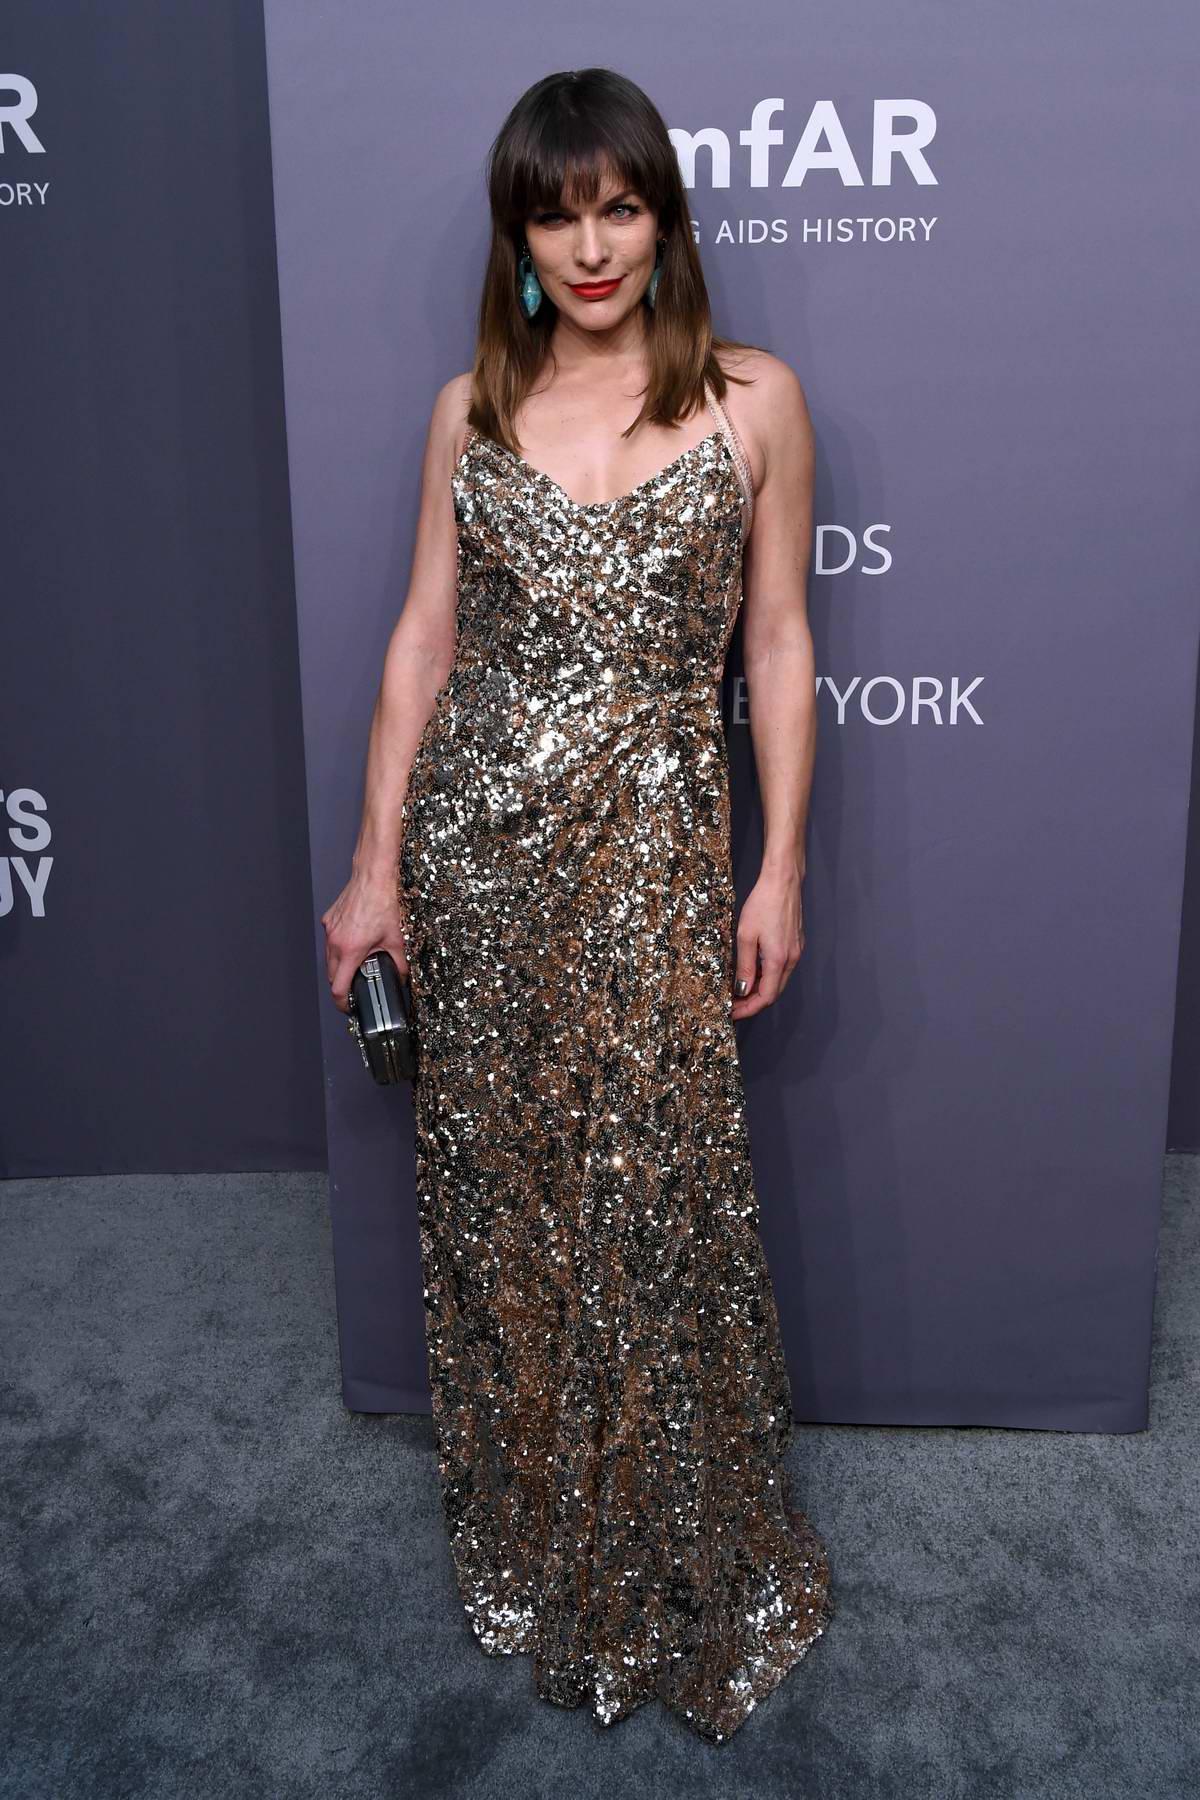 Milla Jovovich attends amfAR New York Gala 2019 at Cipriani Wall Street in New York City